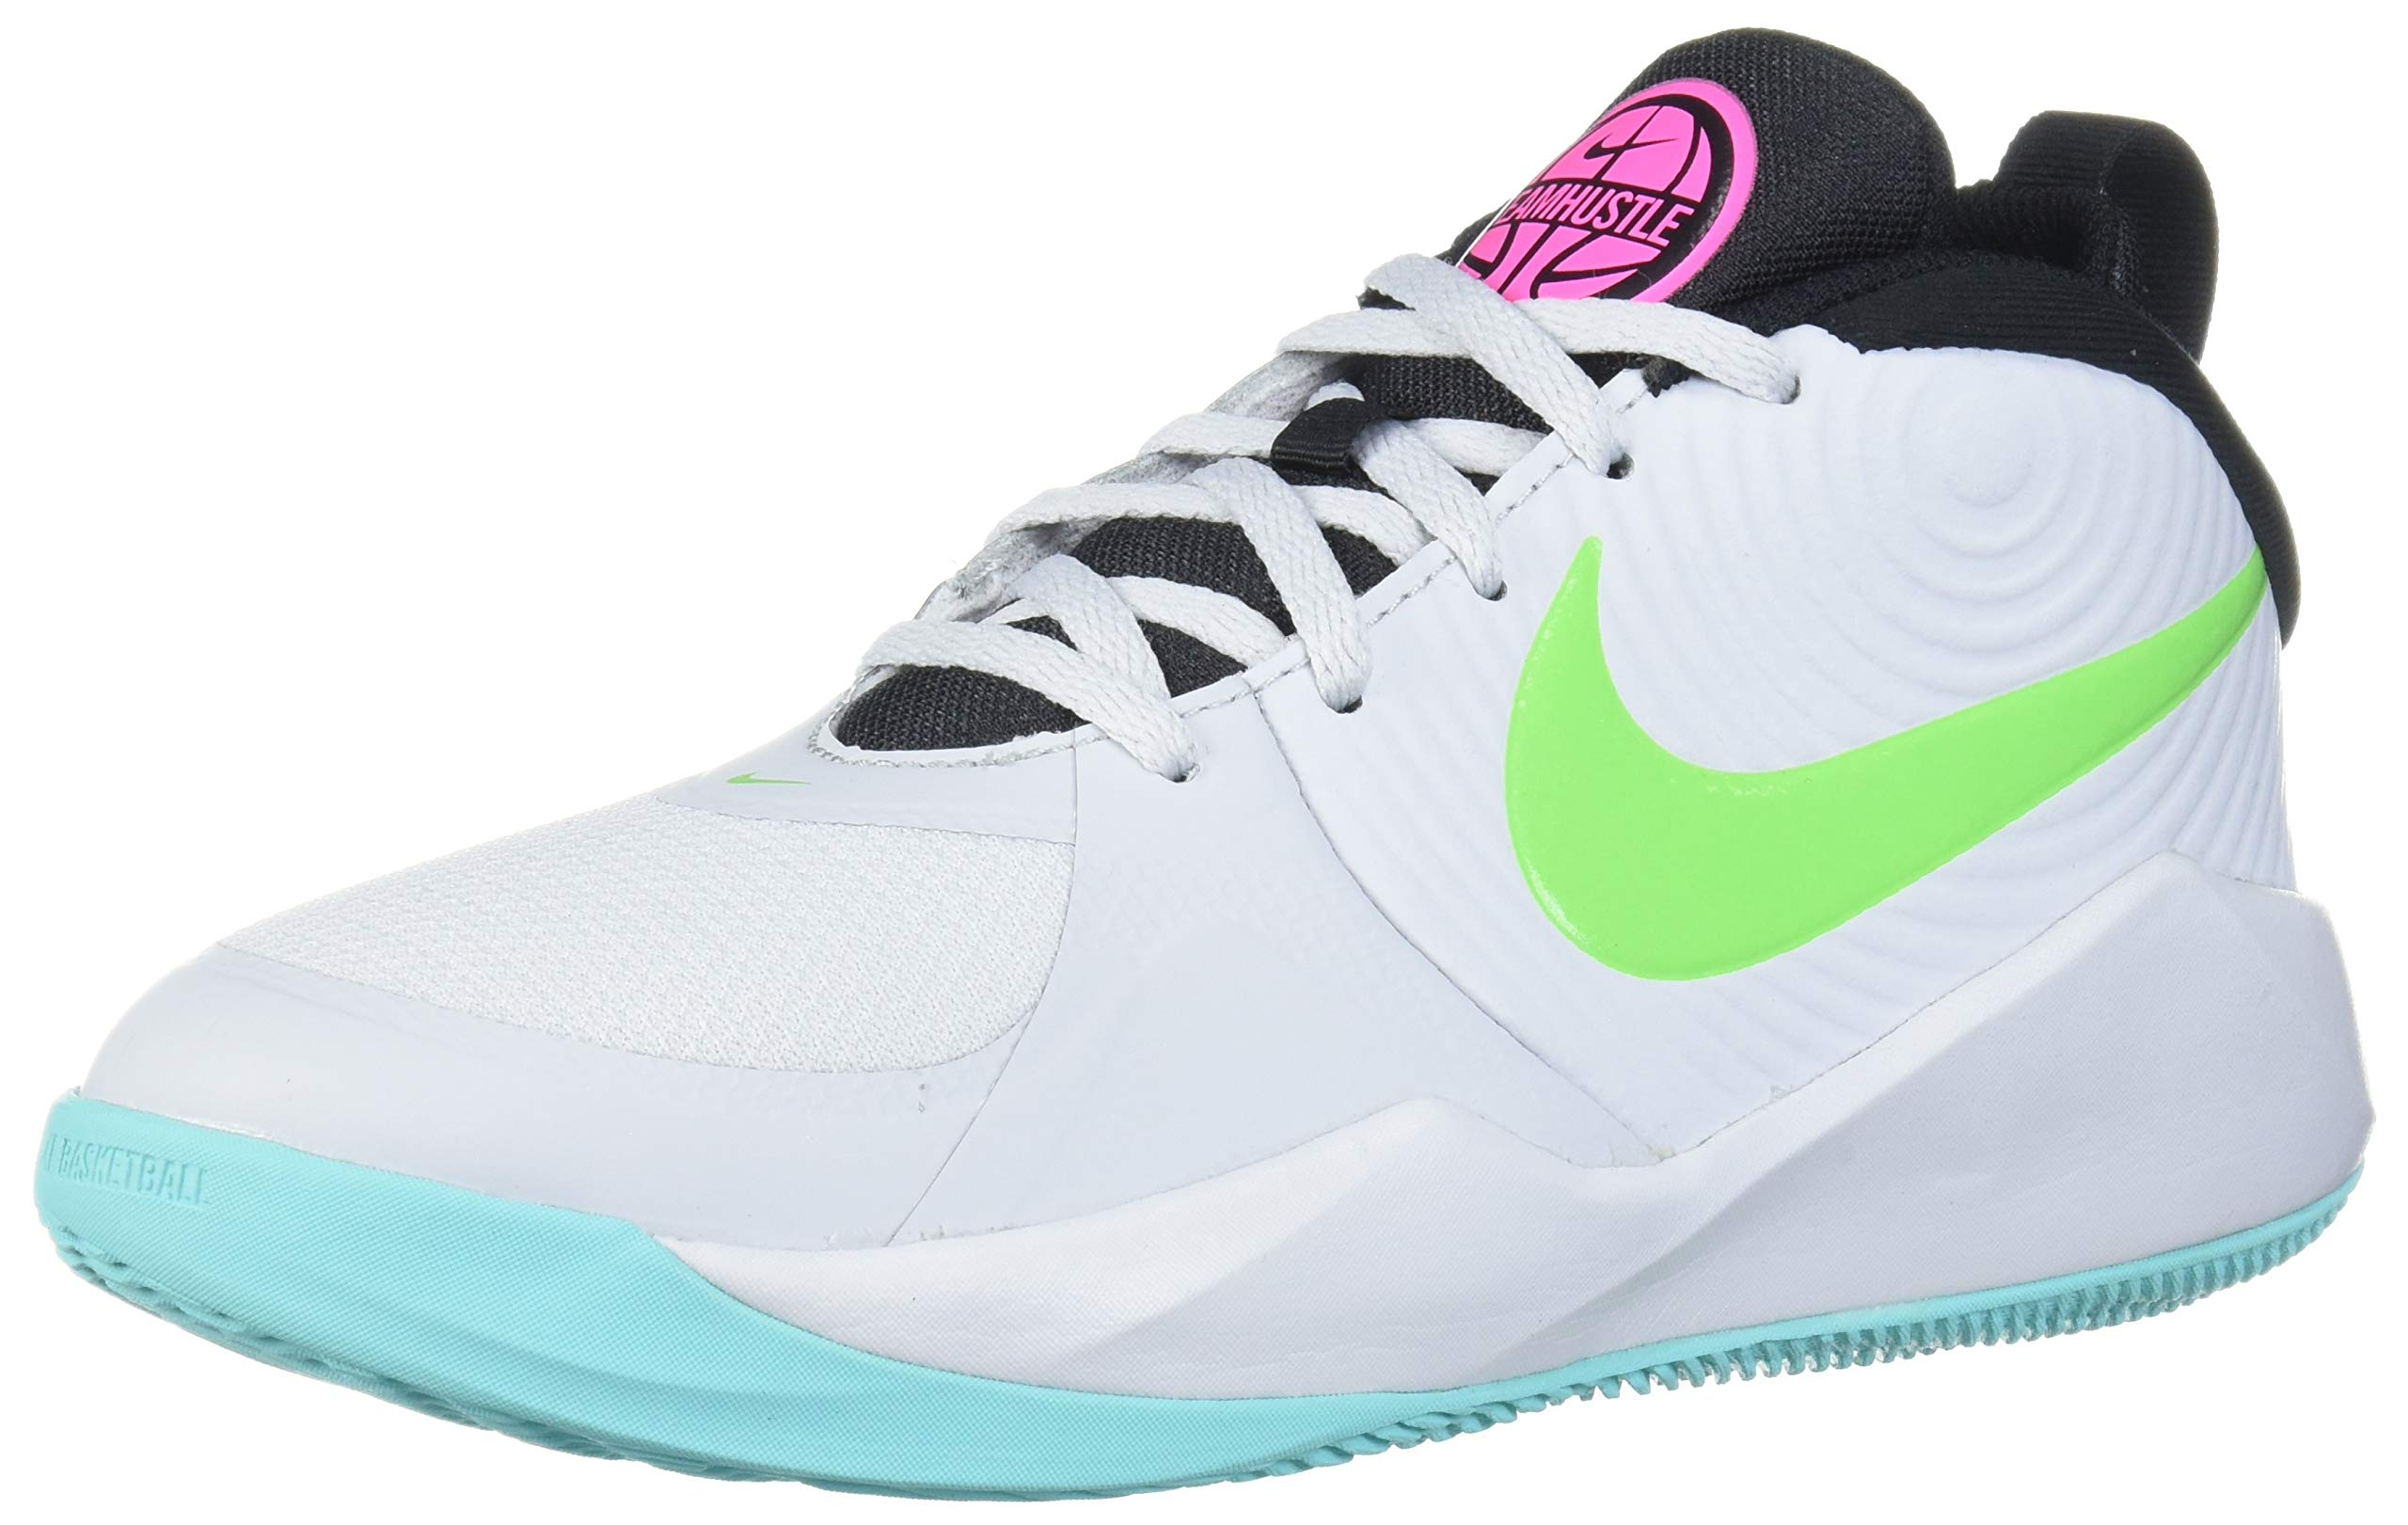 Nike Unisex Team Hustle D 9 Grade School Basketball Shoe, Pure Platinum/Electric Green, 3.5Y Regular US Big Kid by Nike